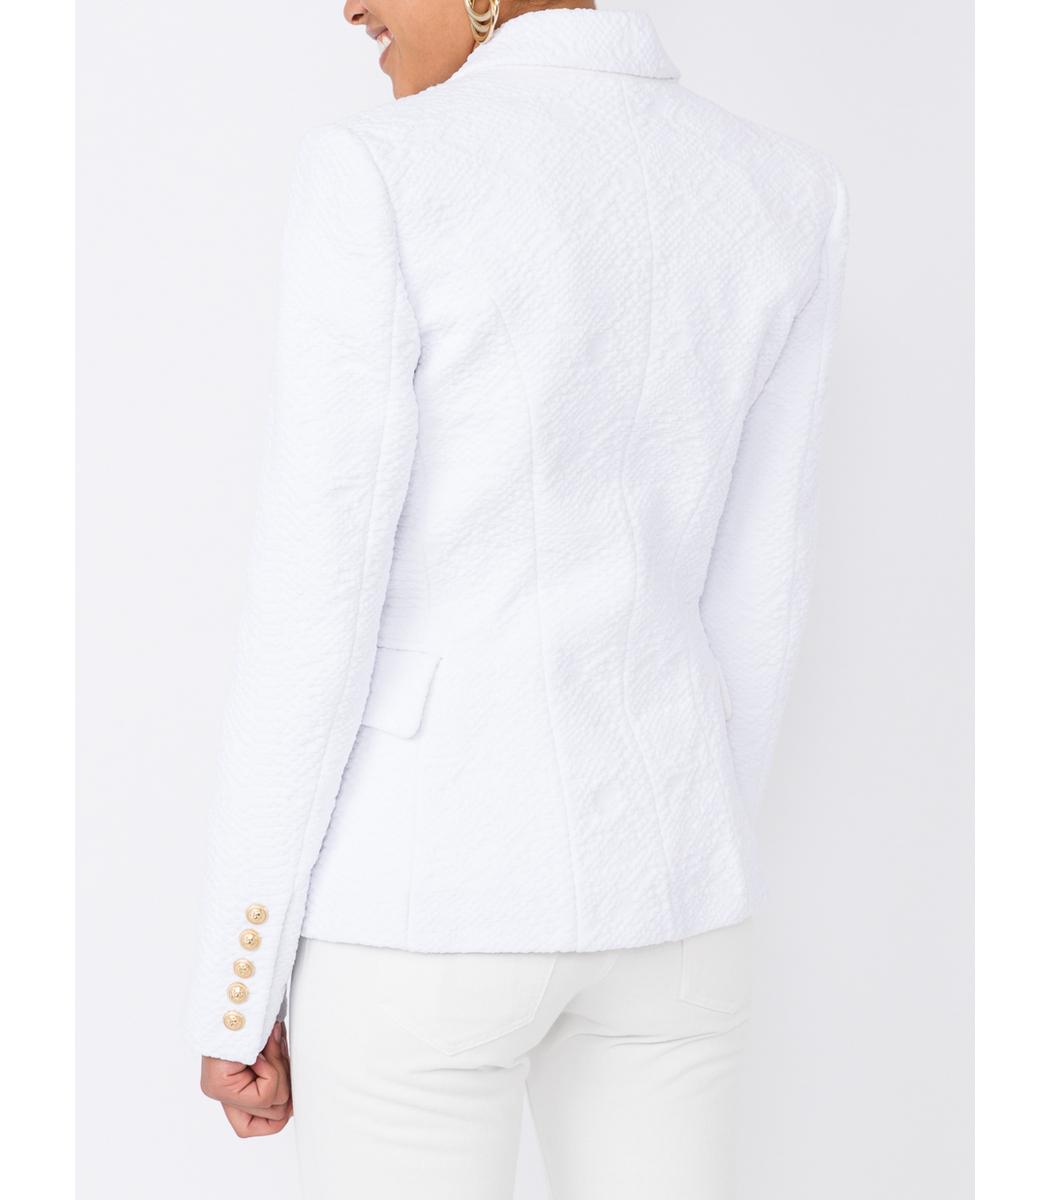 Balmain Double Breasted Blazer | Balmain Mini Dress | Balmain Coats